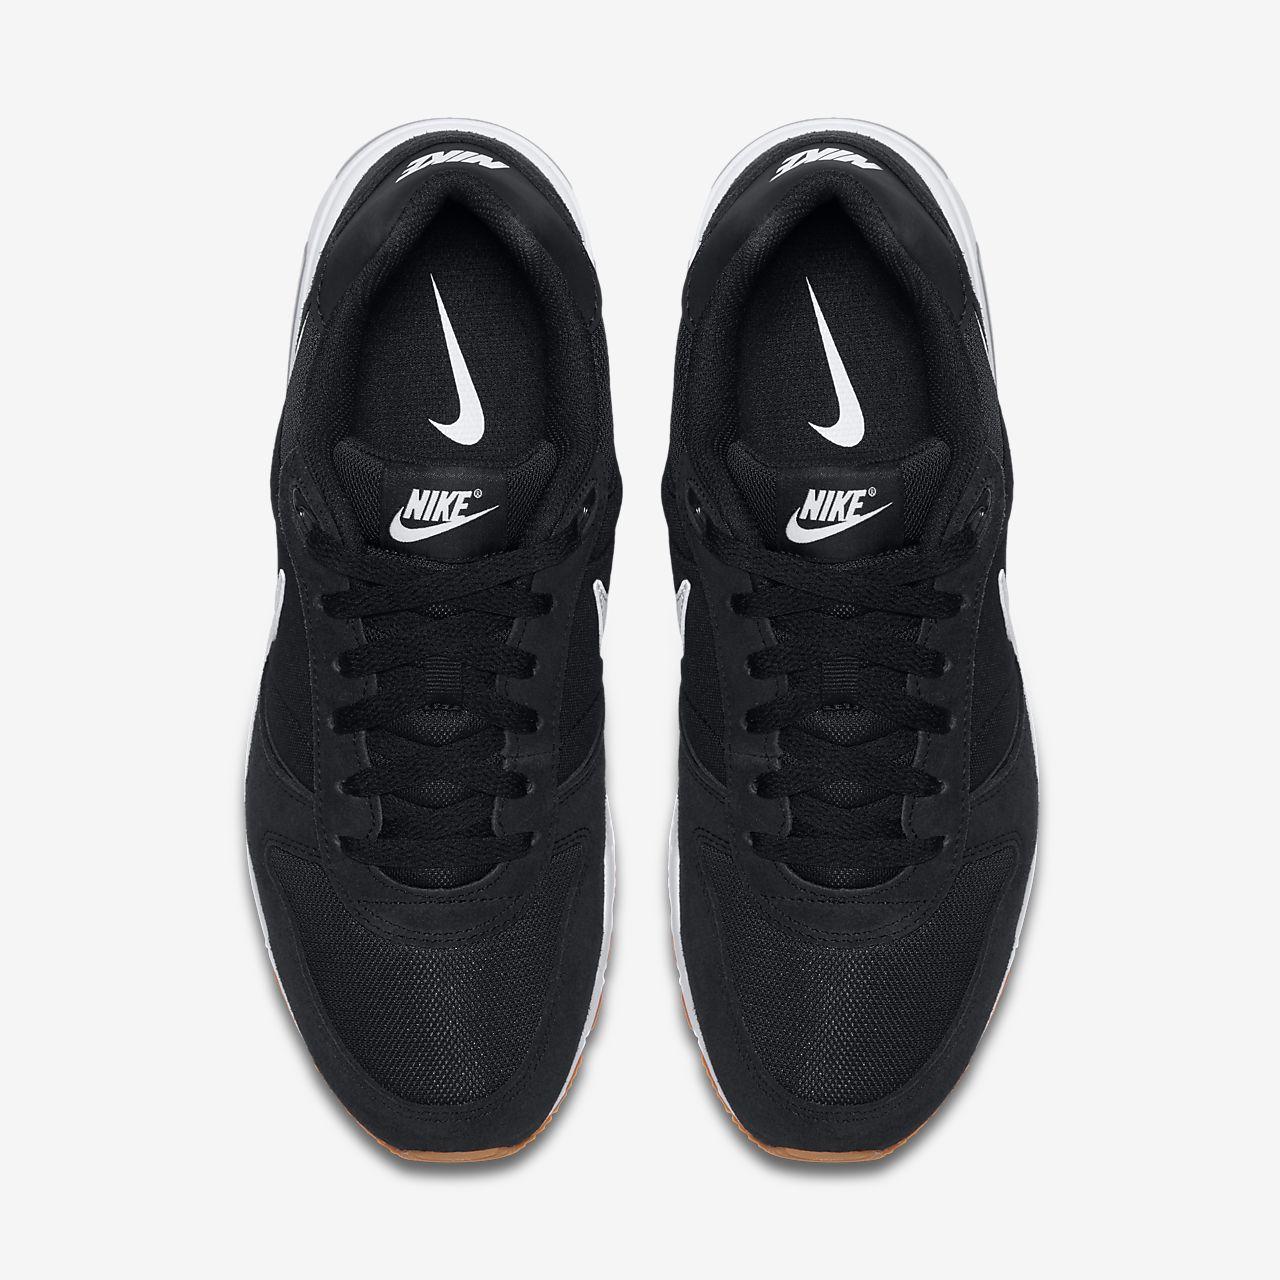 promo code eb651 8b7f5 Low Resolution Nike Nightgazer Men s Shoe Nike Nightgazer Men s Shoe